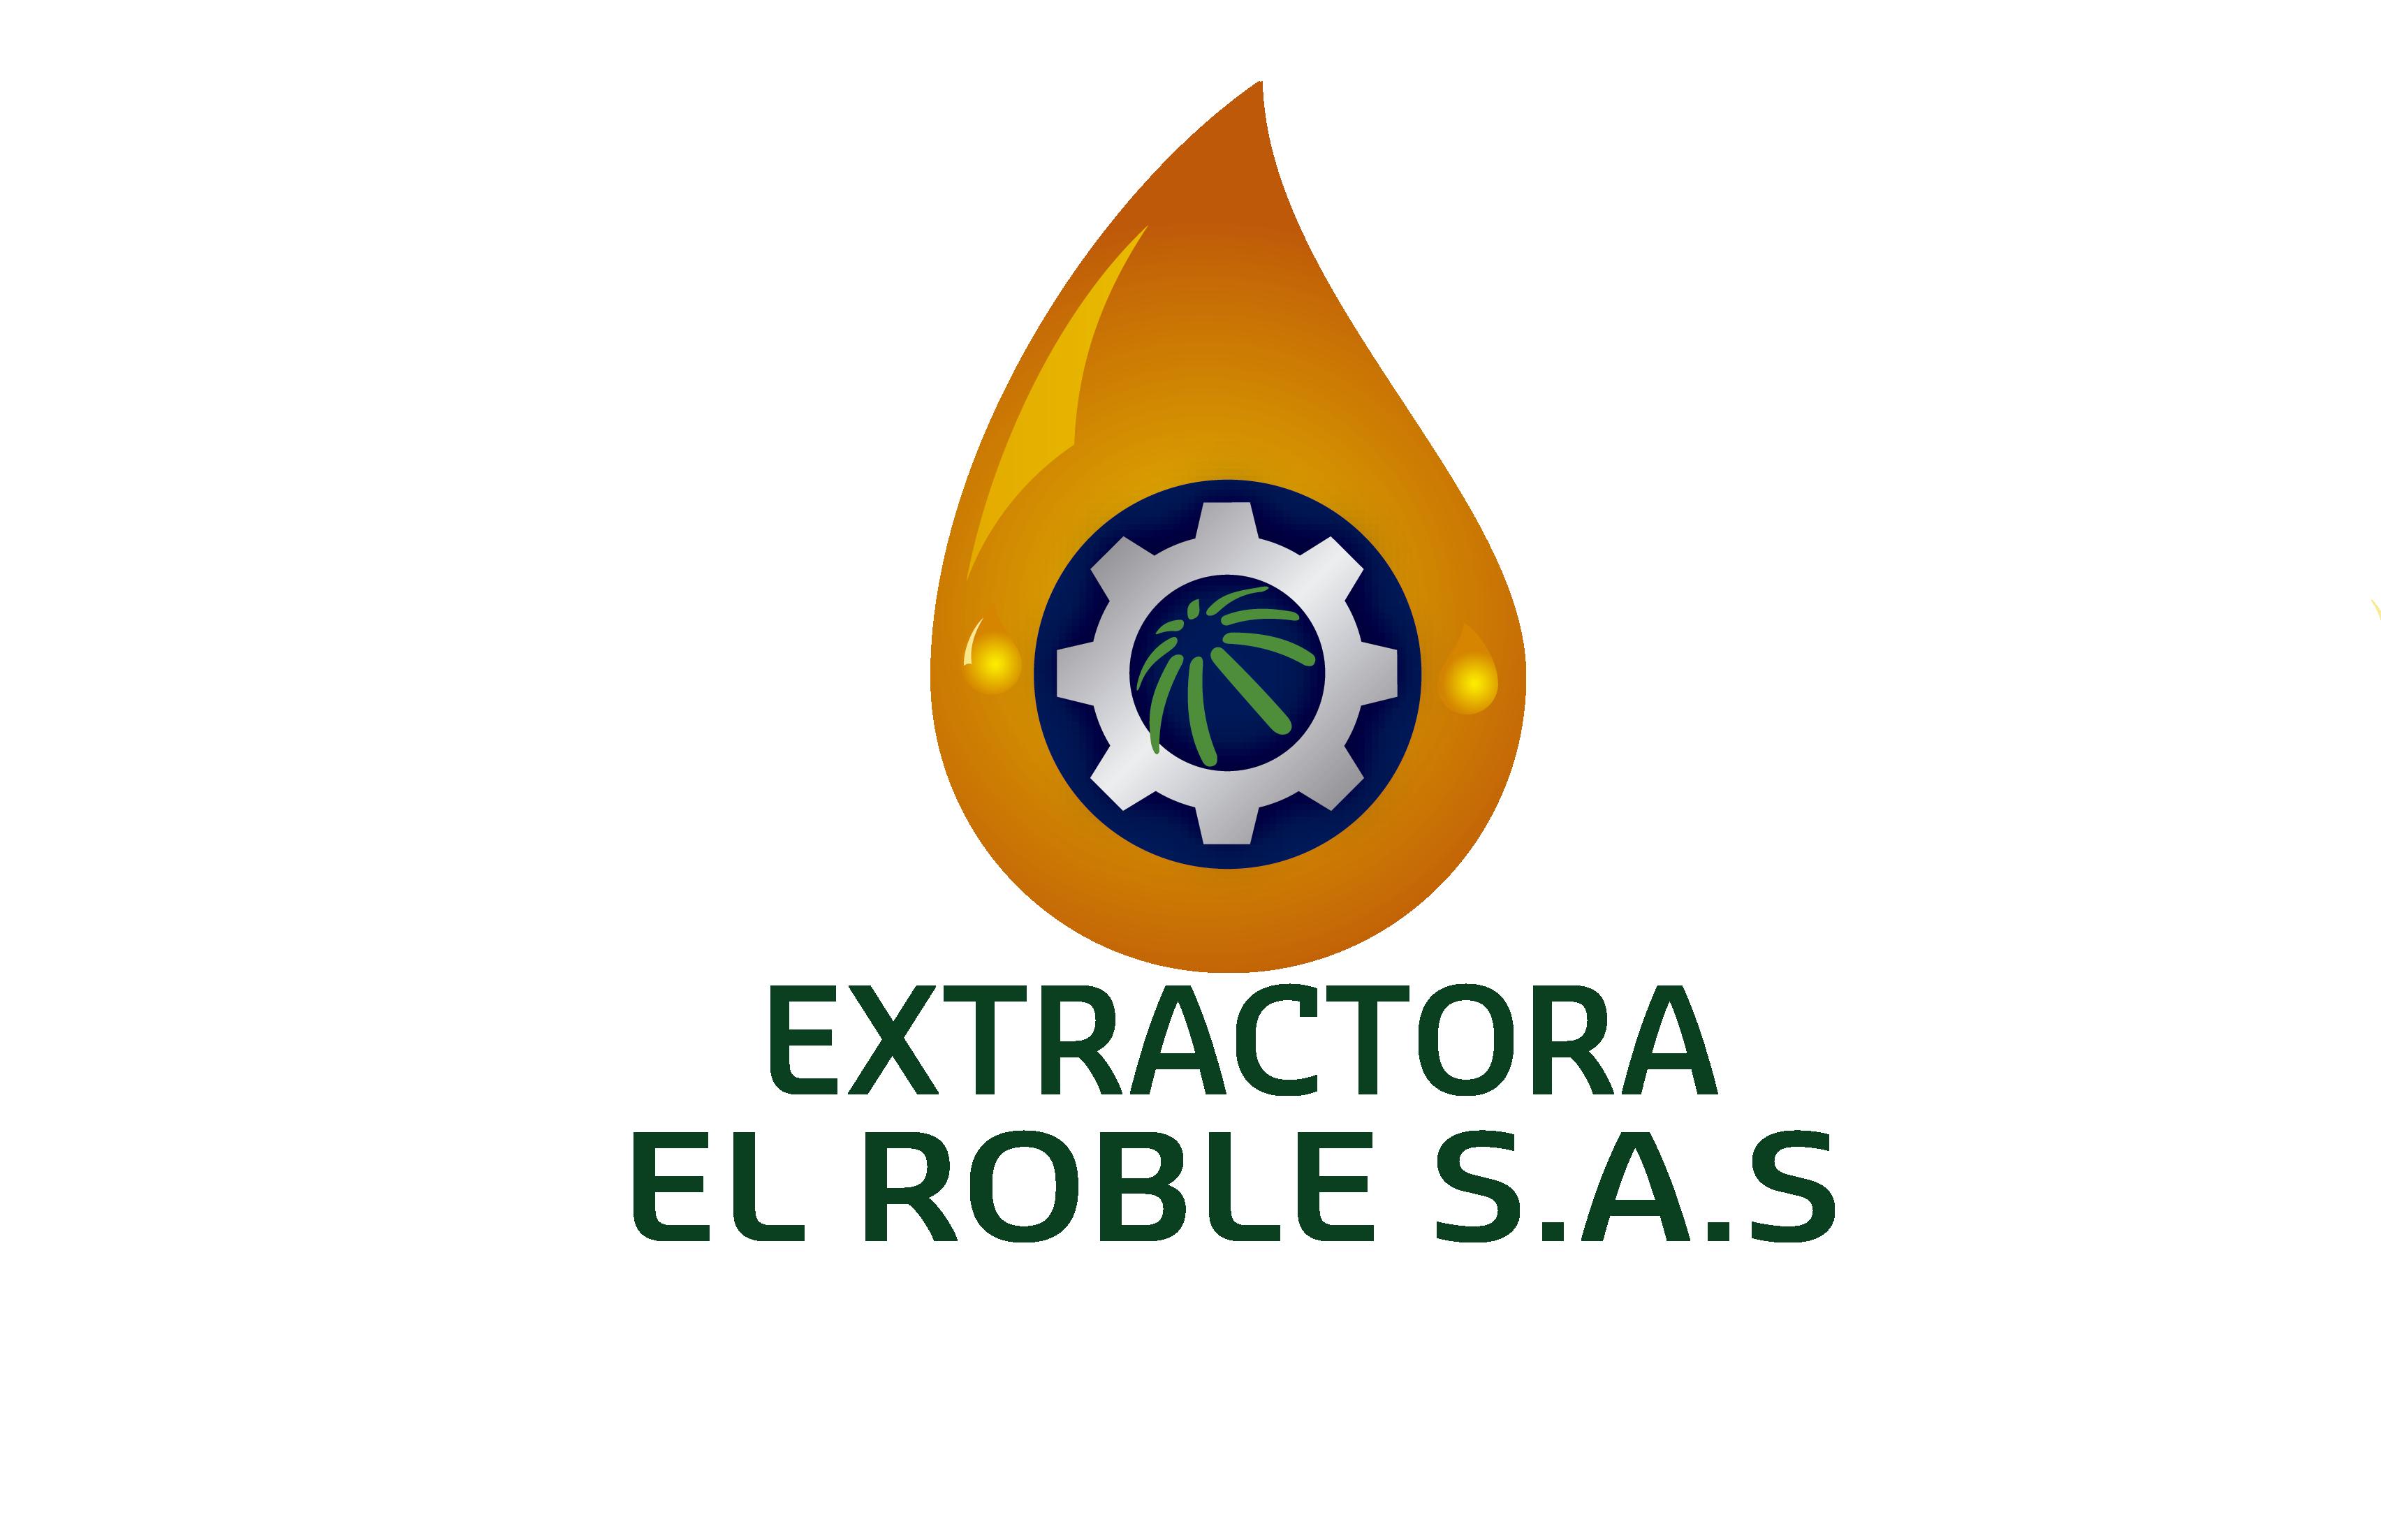 EXTRACTORA EL ROBLE S.A.S